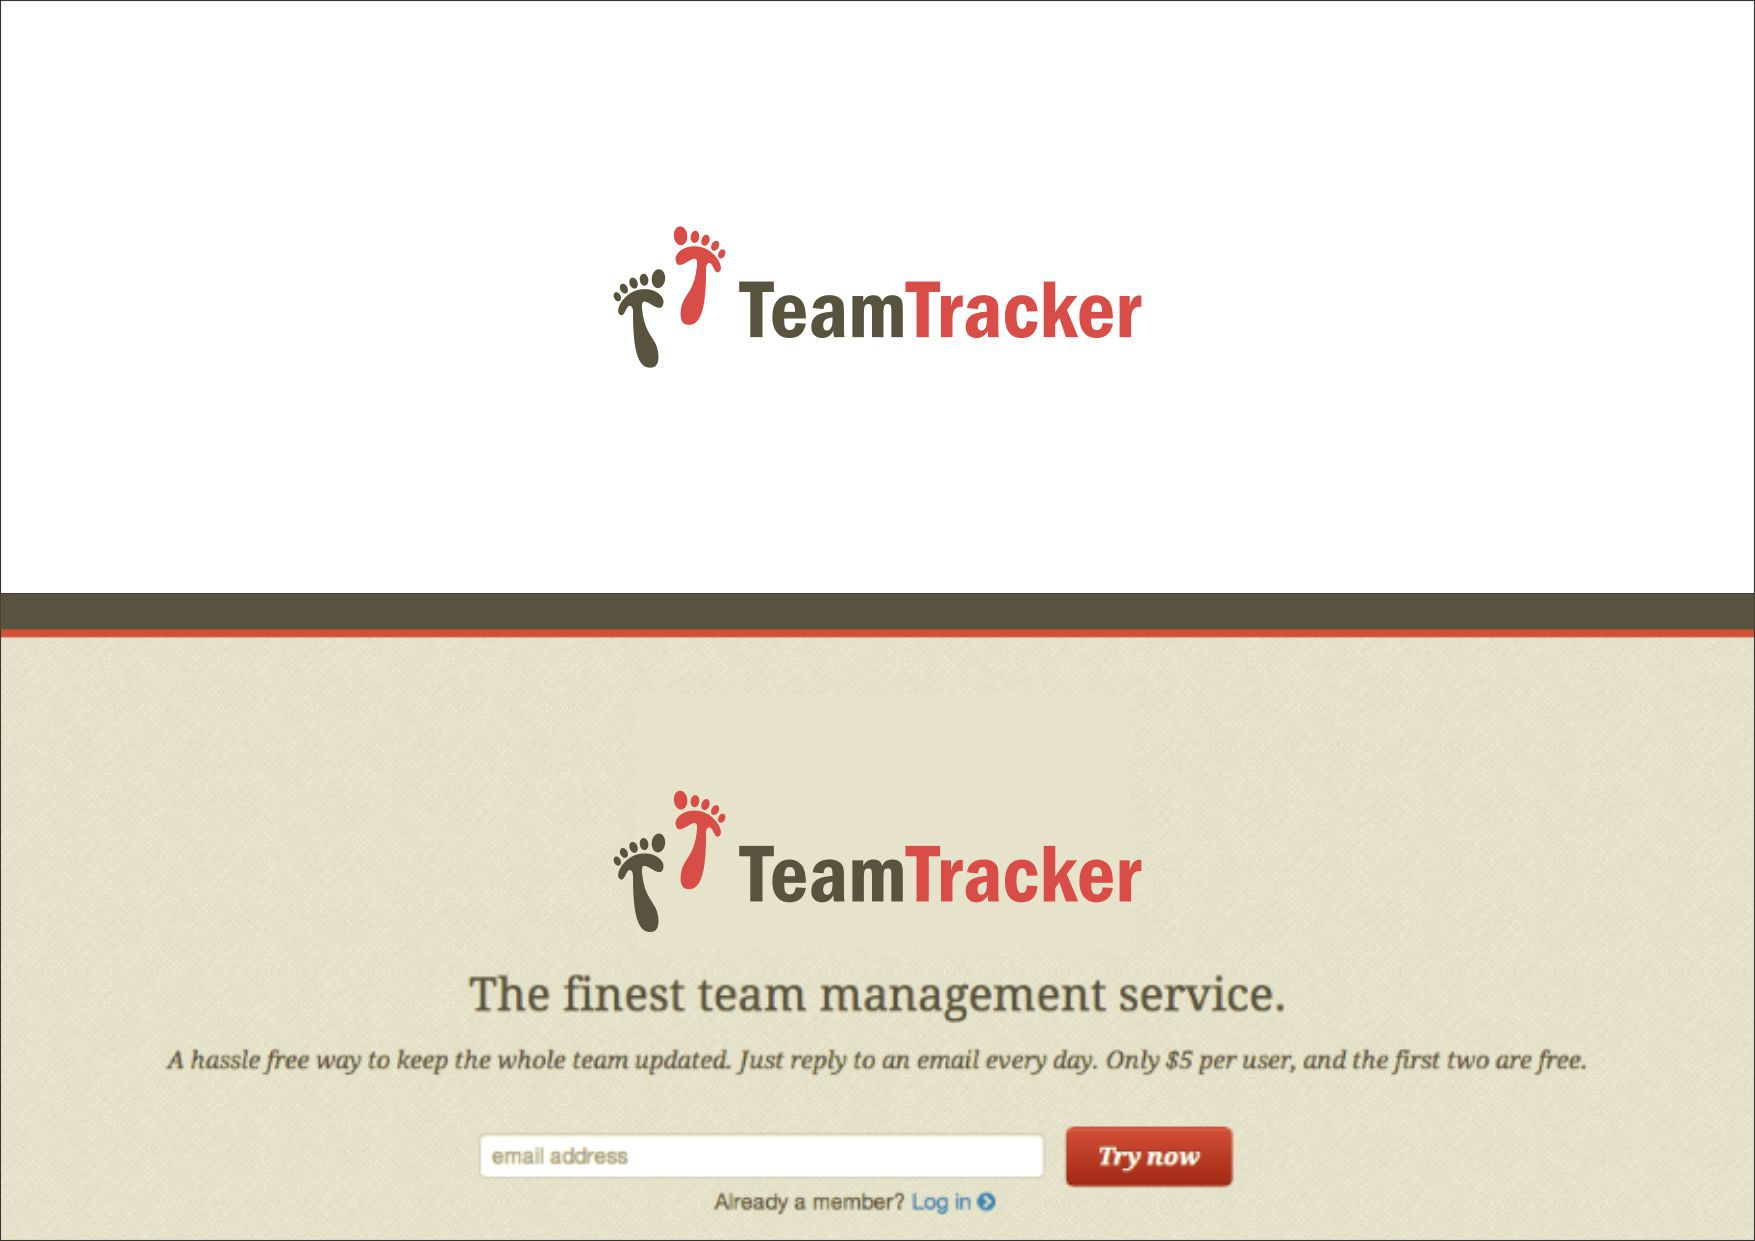 Team Tracker needs a new logo